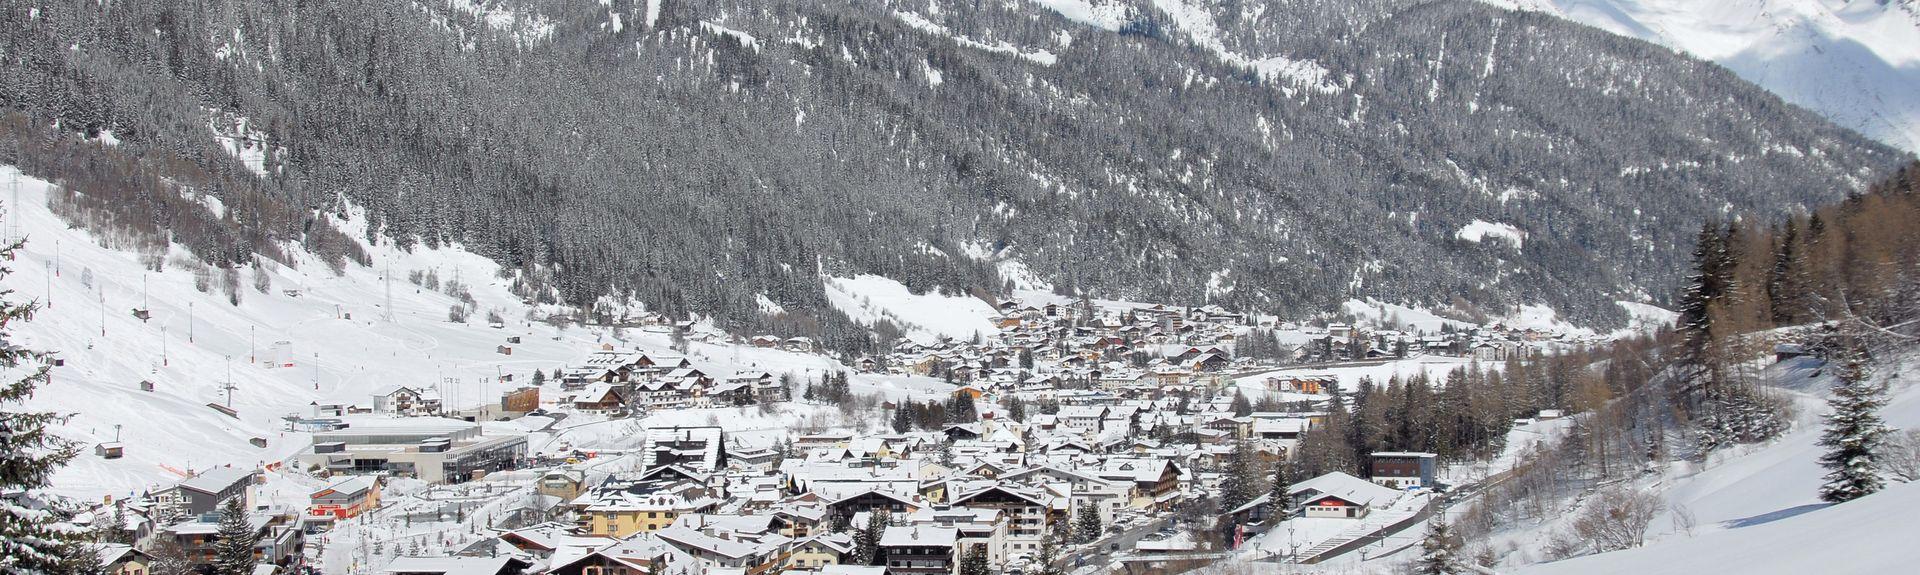 Sankt Anton am Arlberg, Tirol, Áustria